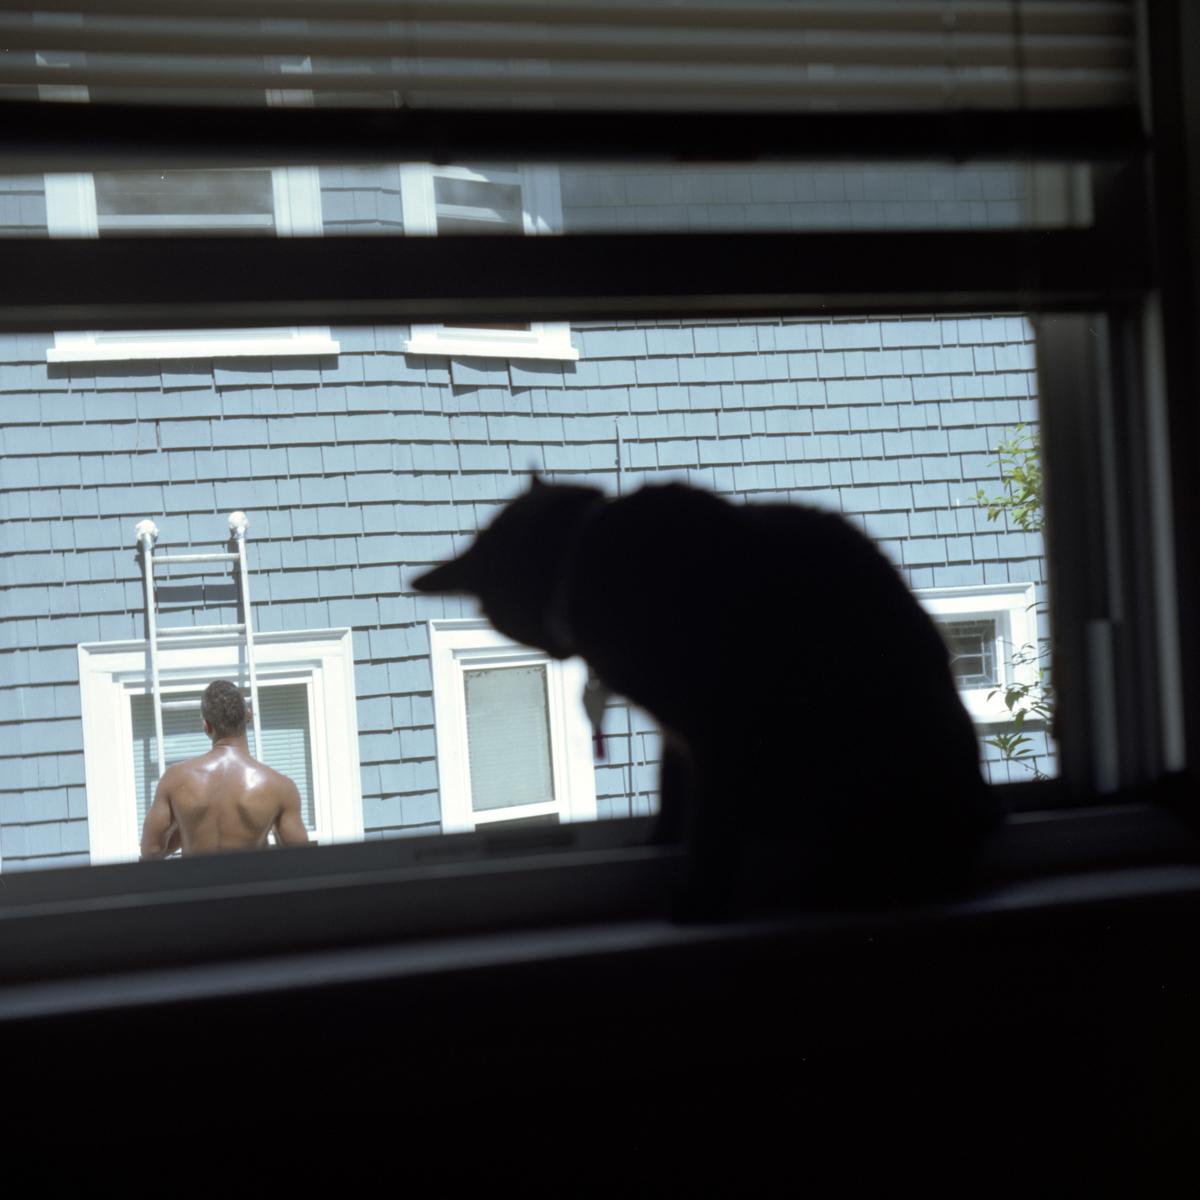 WindowShopping.jpg